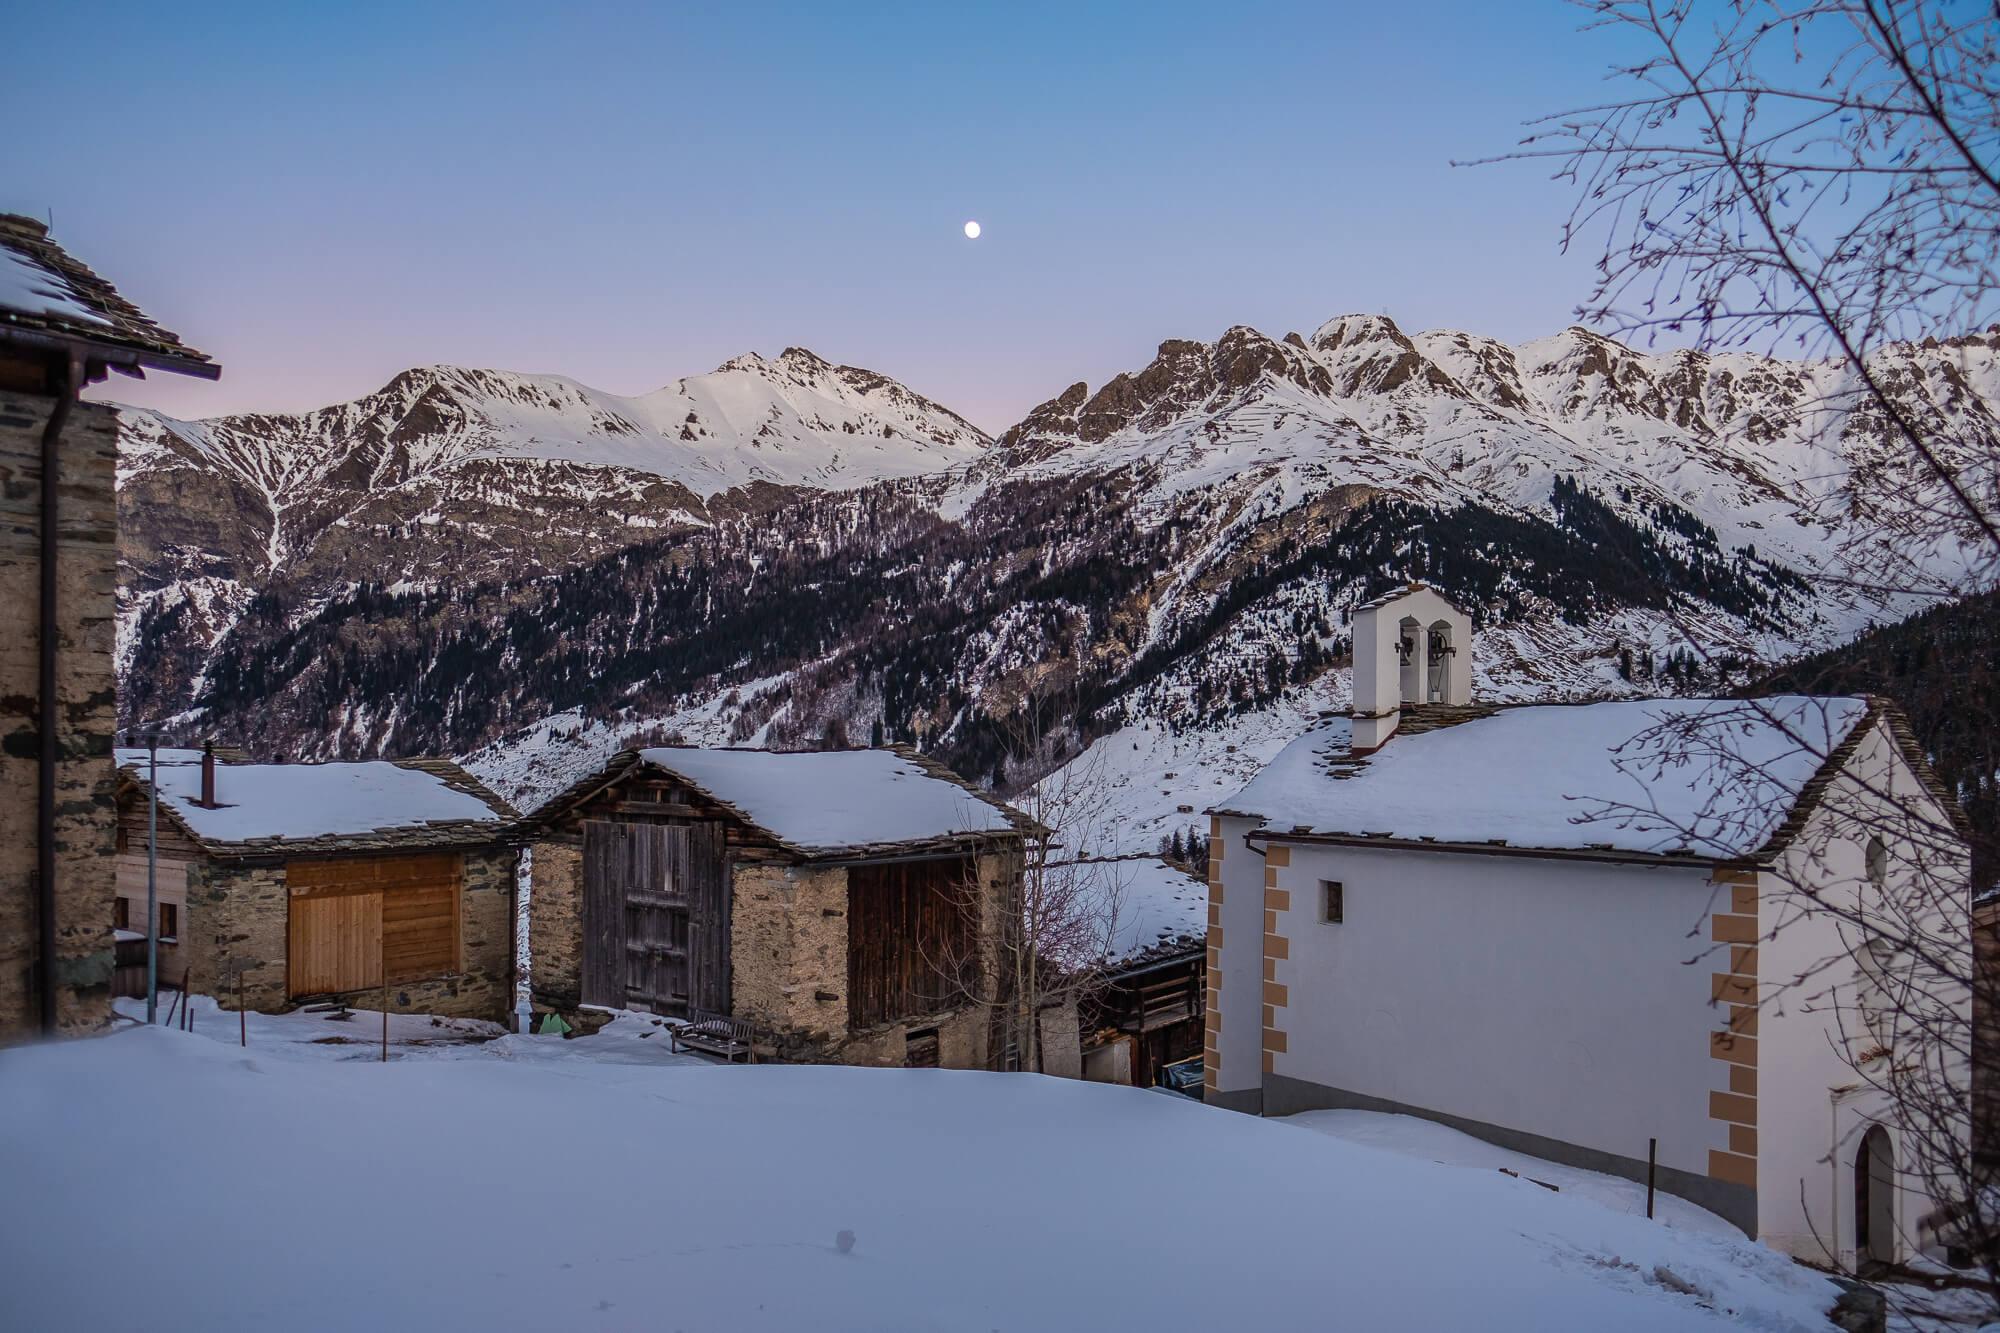 Zumthor Vacation Homes in Leis, Switzerland